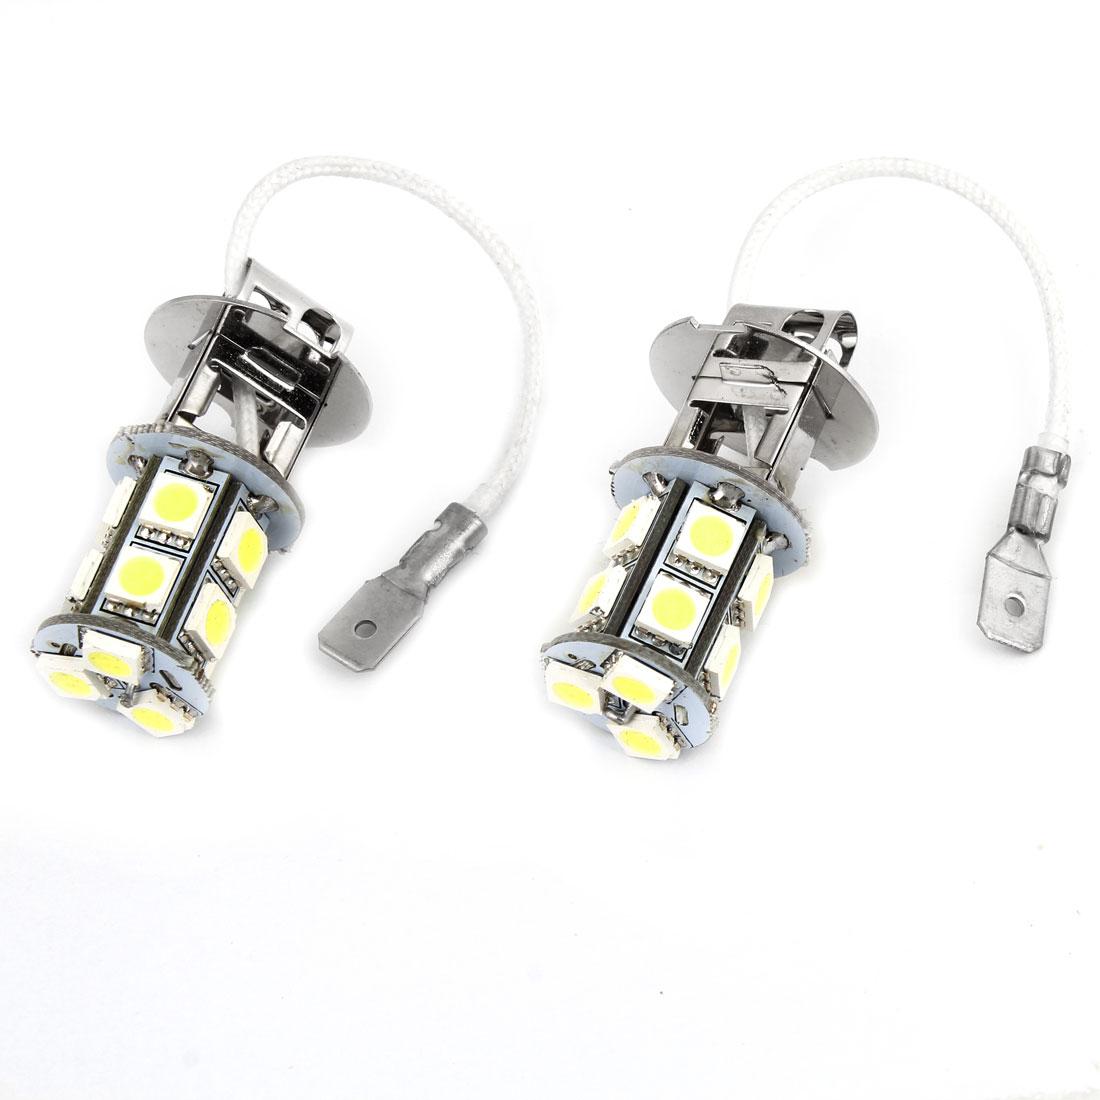 2 Pcs H3 5050 SMD 13 LED Car White DRL Foglight Bulb Headlamp DC 12V